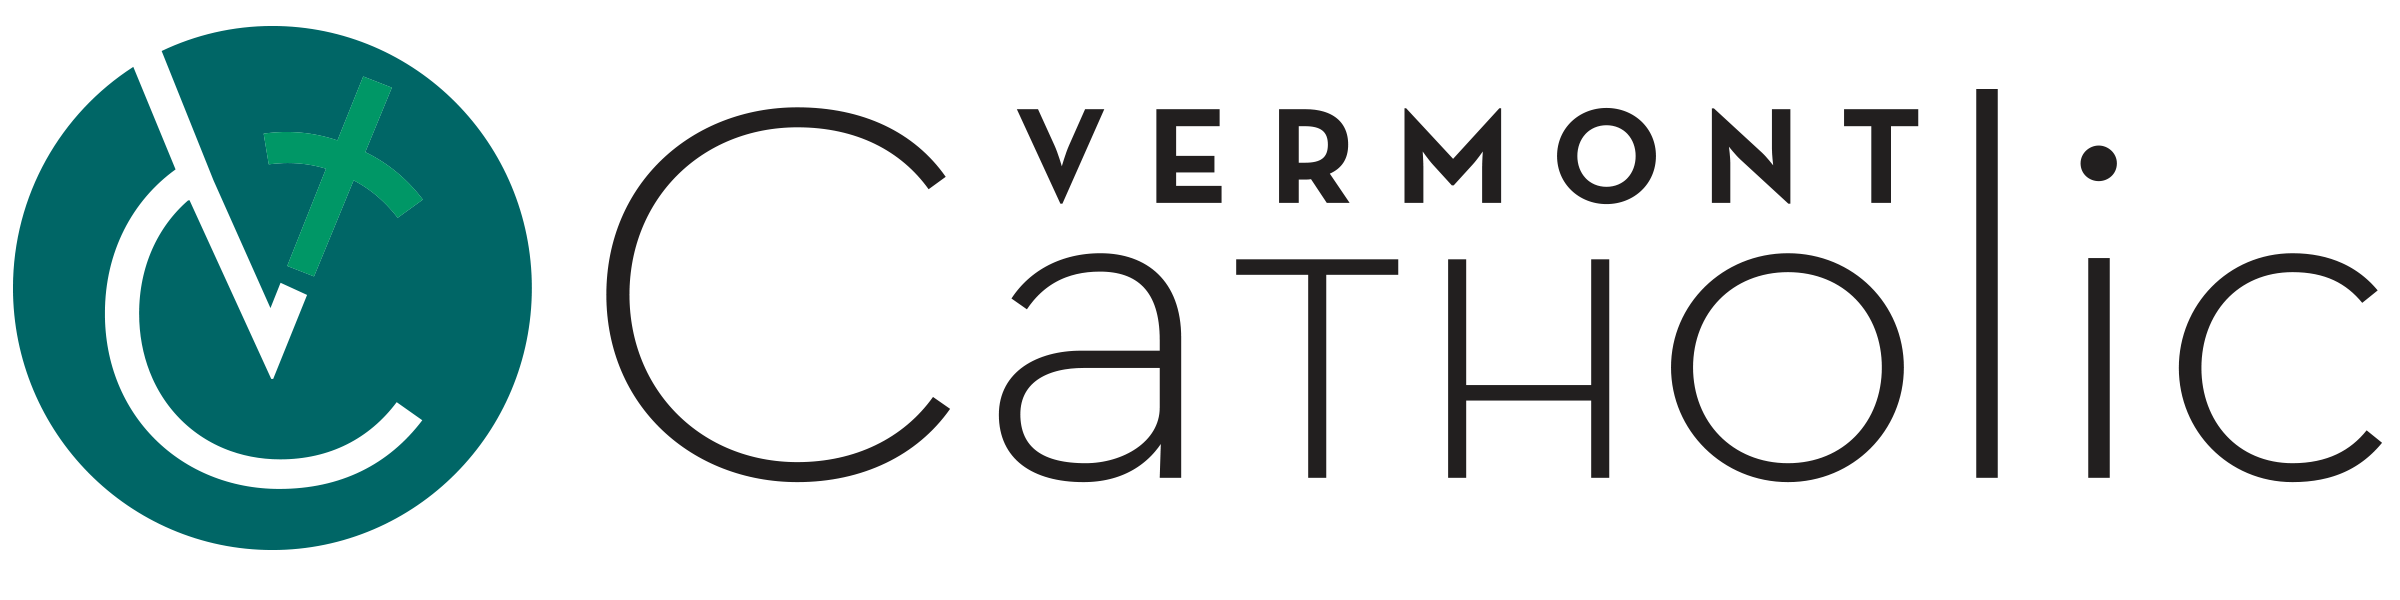 Vermont Catholic News - Roman Catholic Diocese of Burlington